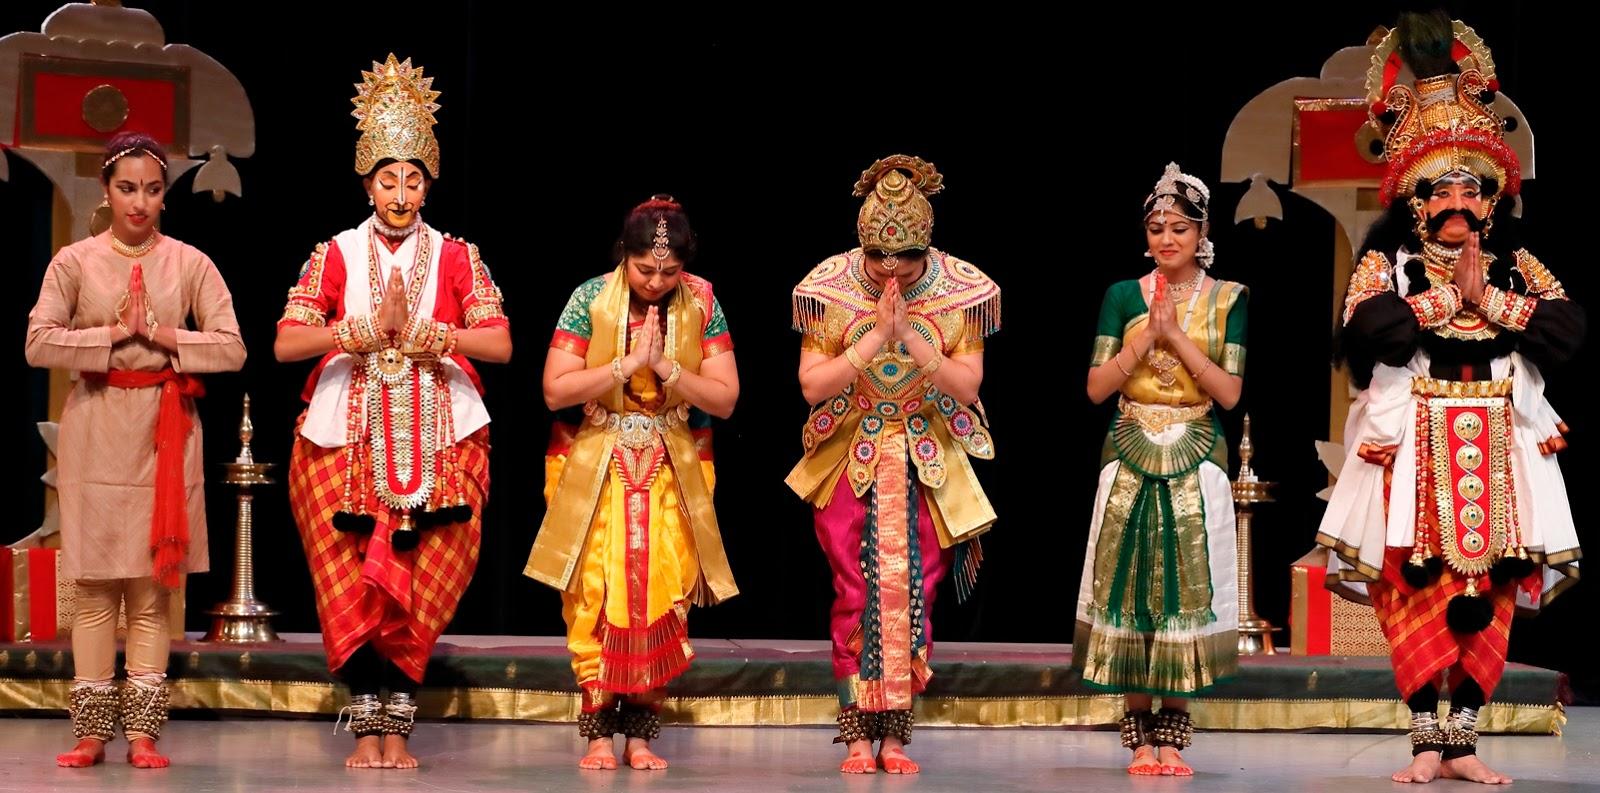 Nrityapriya Fine Arts Bharatanatyam Indian Classical Dance In Posted By Srihari Rao On Thursday January 6 2011 5comments Front Desk Geetha Babu Renju Swaminathan Mehernaz Mathur Roopa Smitha Kalluparambil Lakshmi Palde Brochure Distribution Lasya And Akshara Amudhan